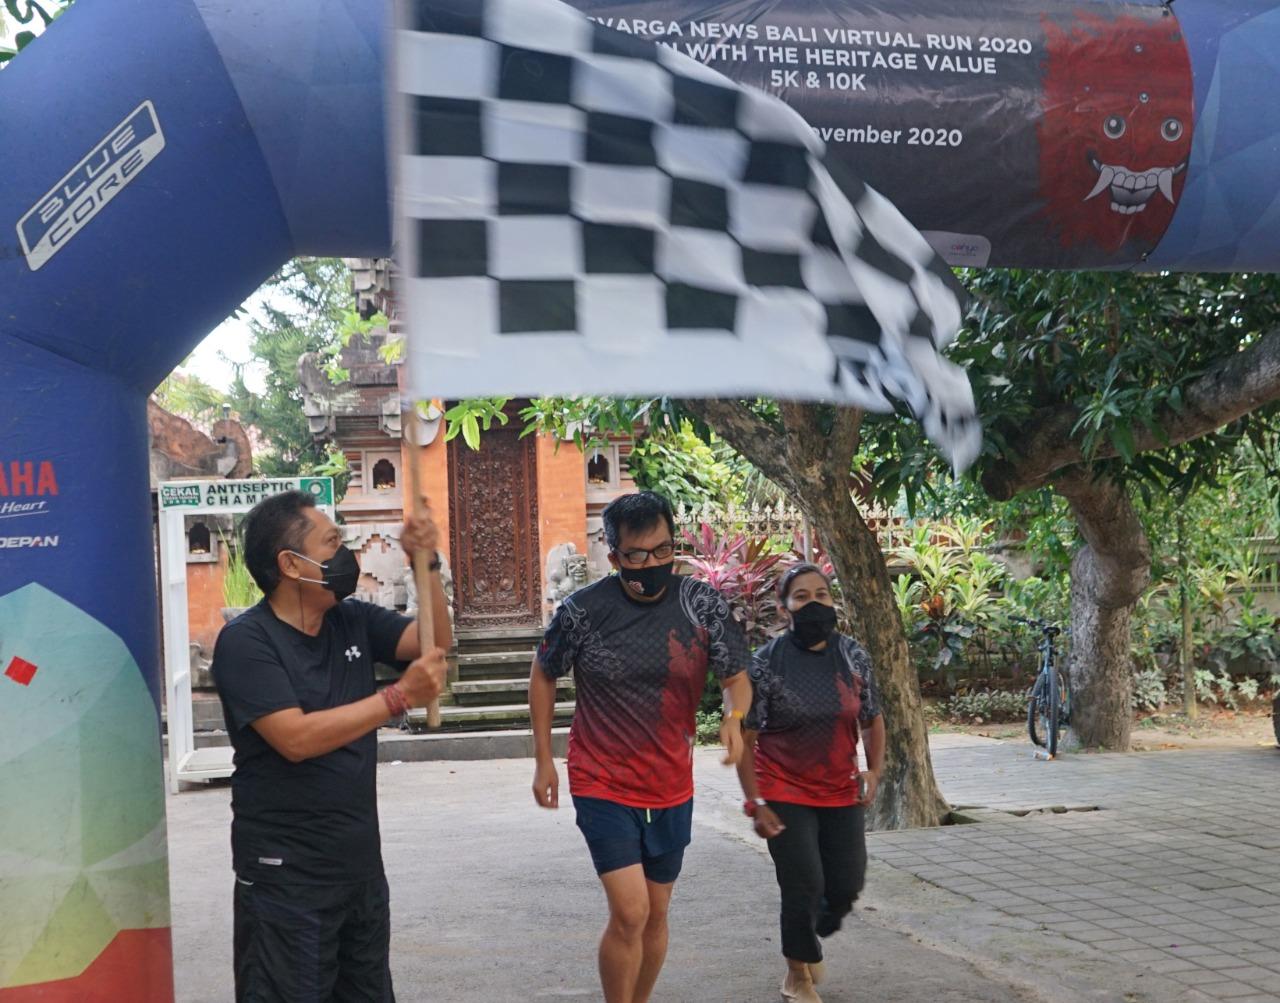 WALI Kota Denpasar I.B Rai Dharmawijaya Mantra membuka Bali Virtual Run 2020 pada Minggu (15/11/2020) ditandai dengan pengibasan bendera start. Foto: ist